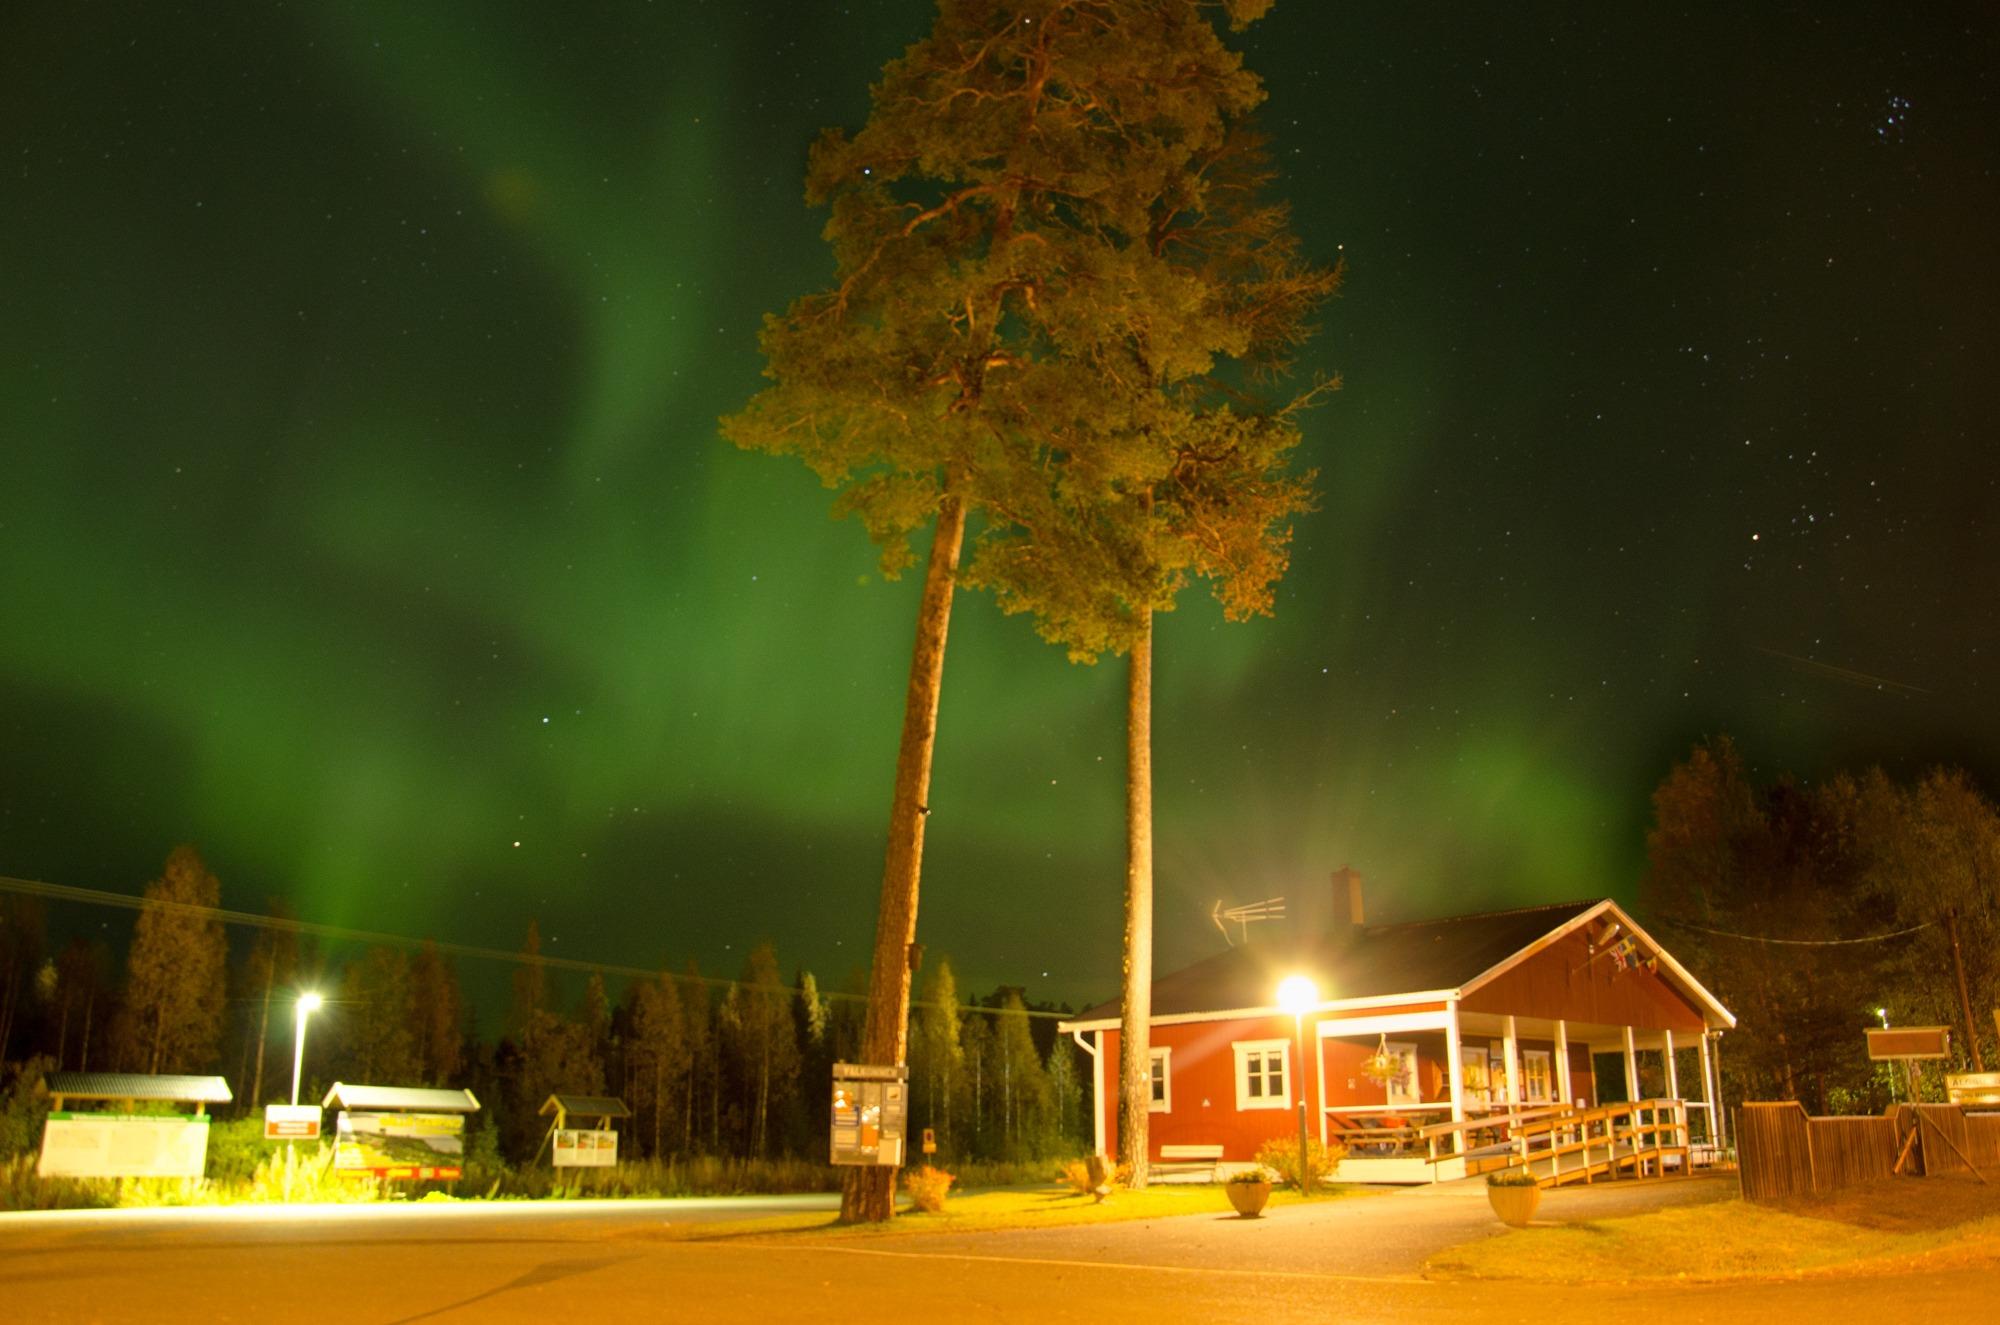 Gimarasten-Bracke-Sweden-Cafe-Restaurant-Aurora-Borealis.jpg